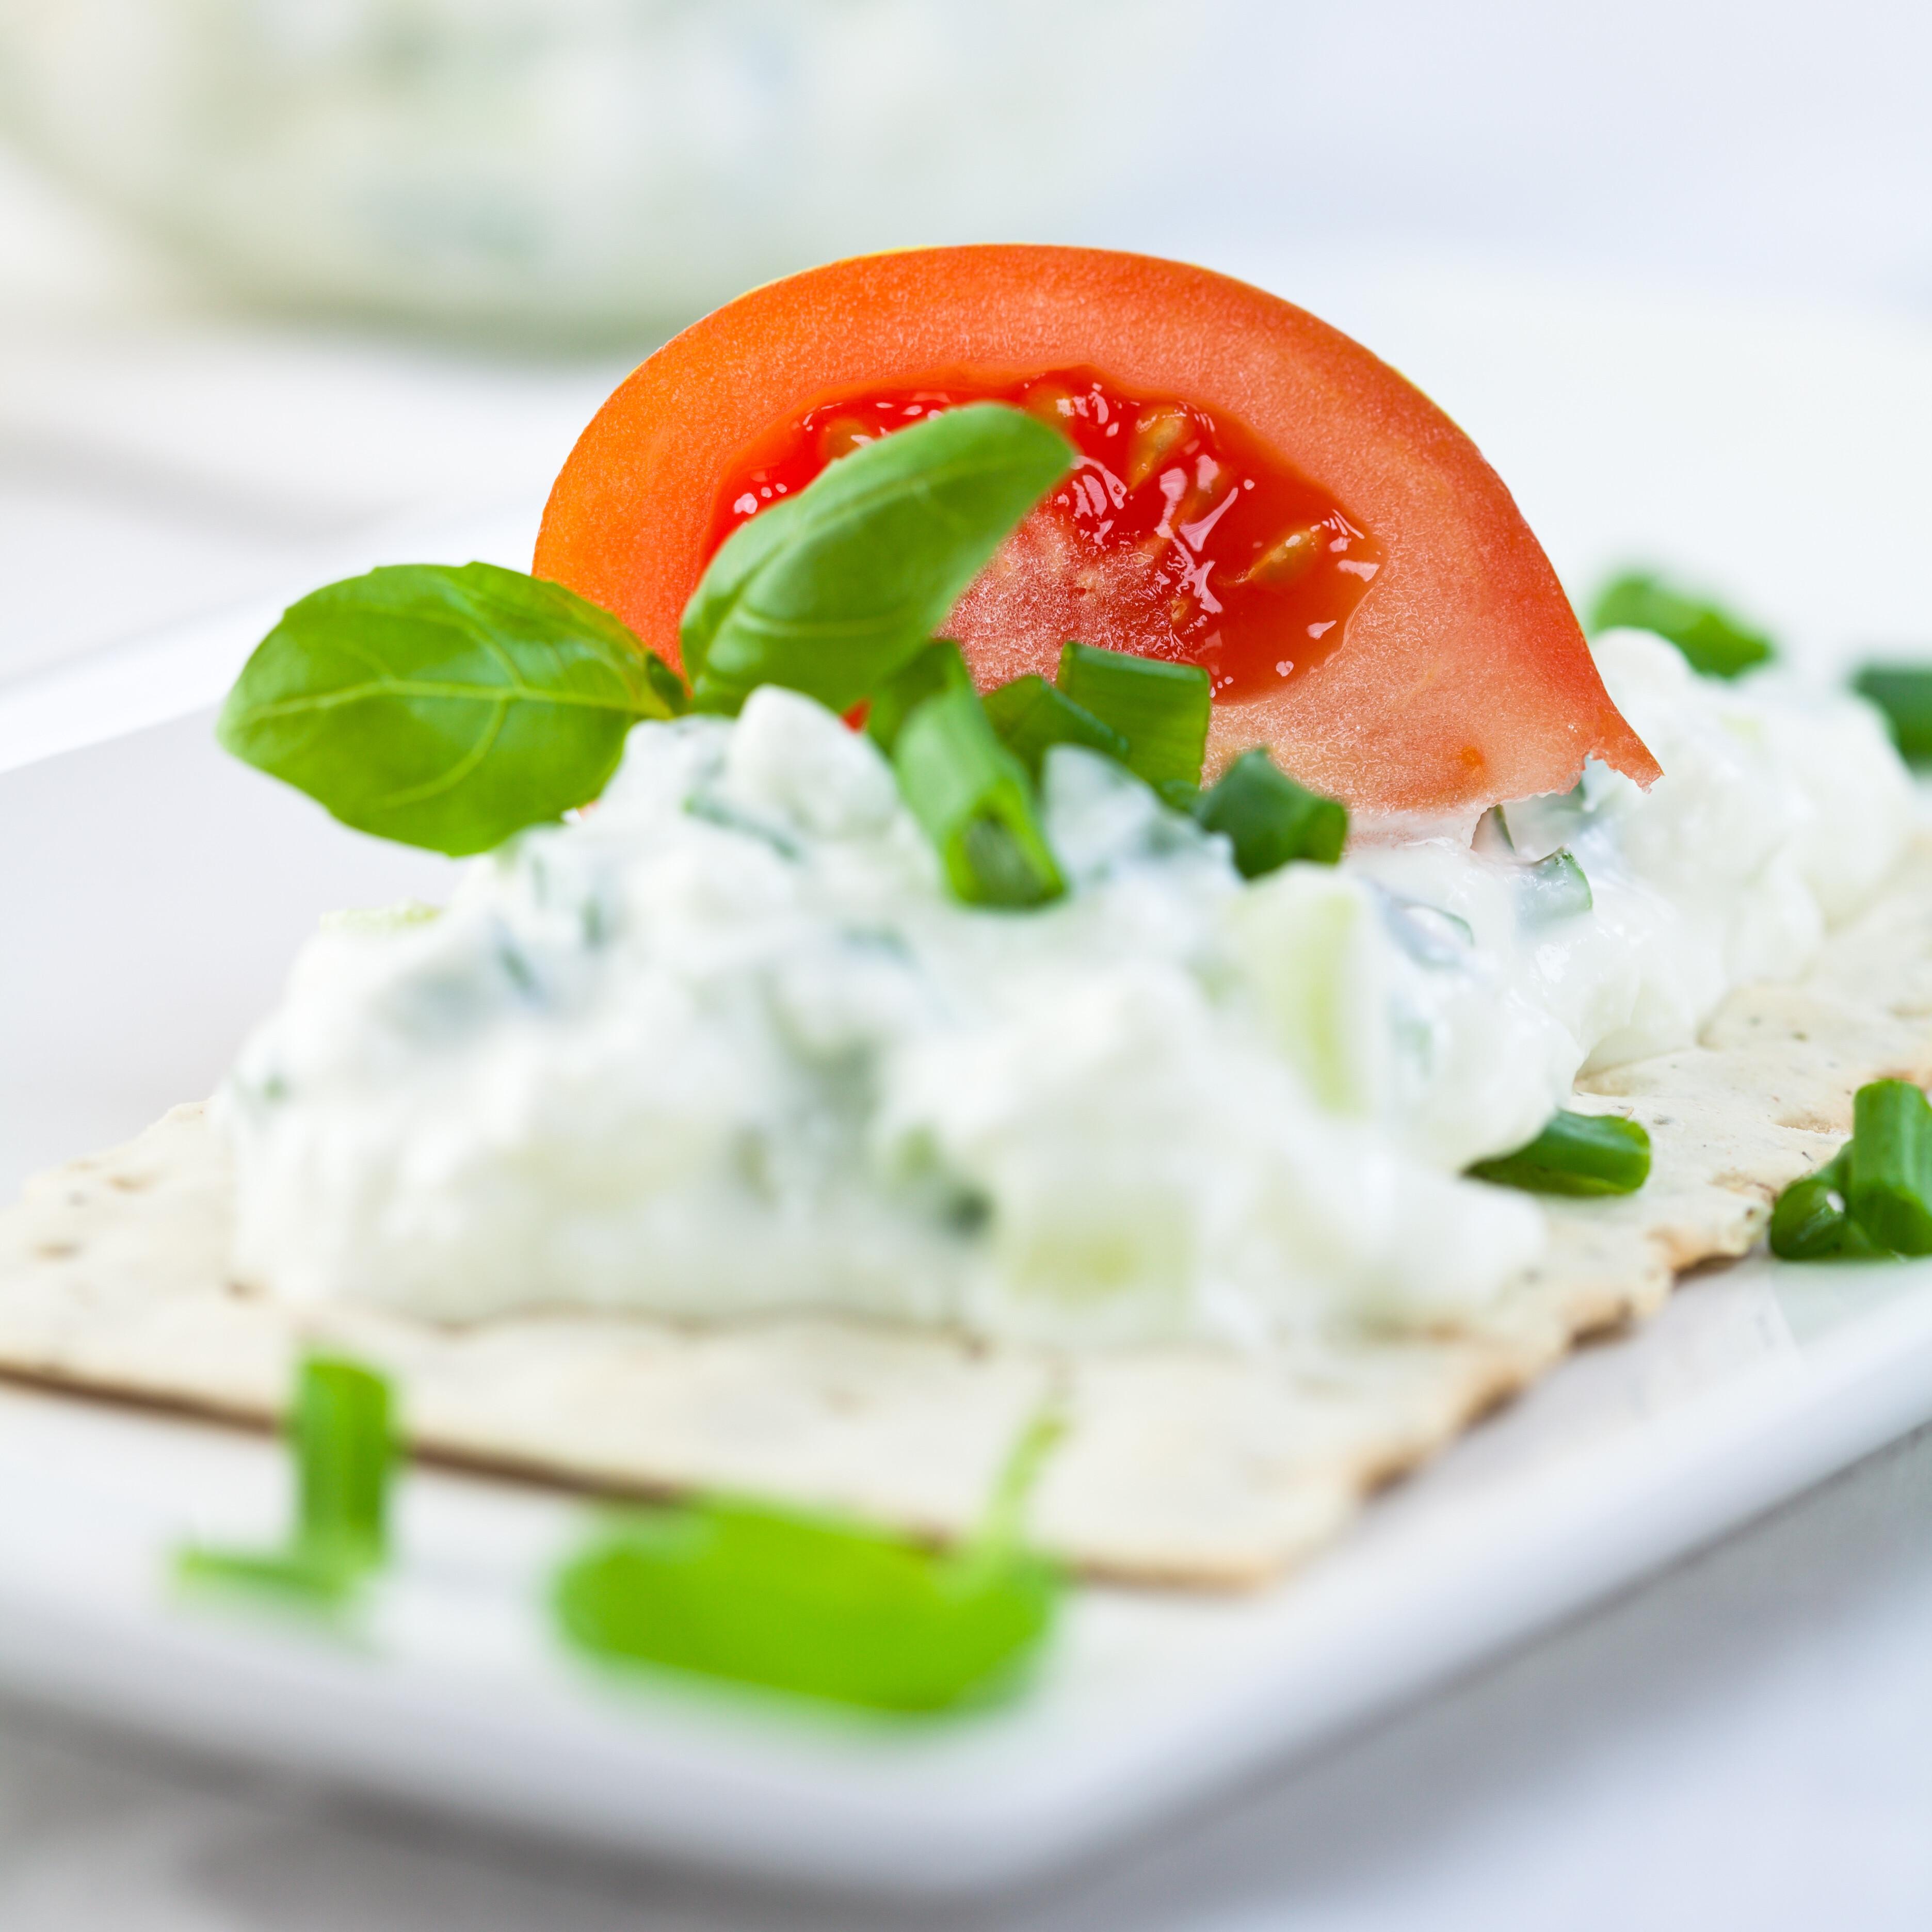 Katabolie mit einfachen, würzige Appetit machenden Rezepten entgegenwirken. © B. and E. Dudzinscy / shutterstock.com